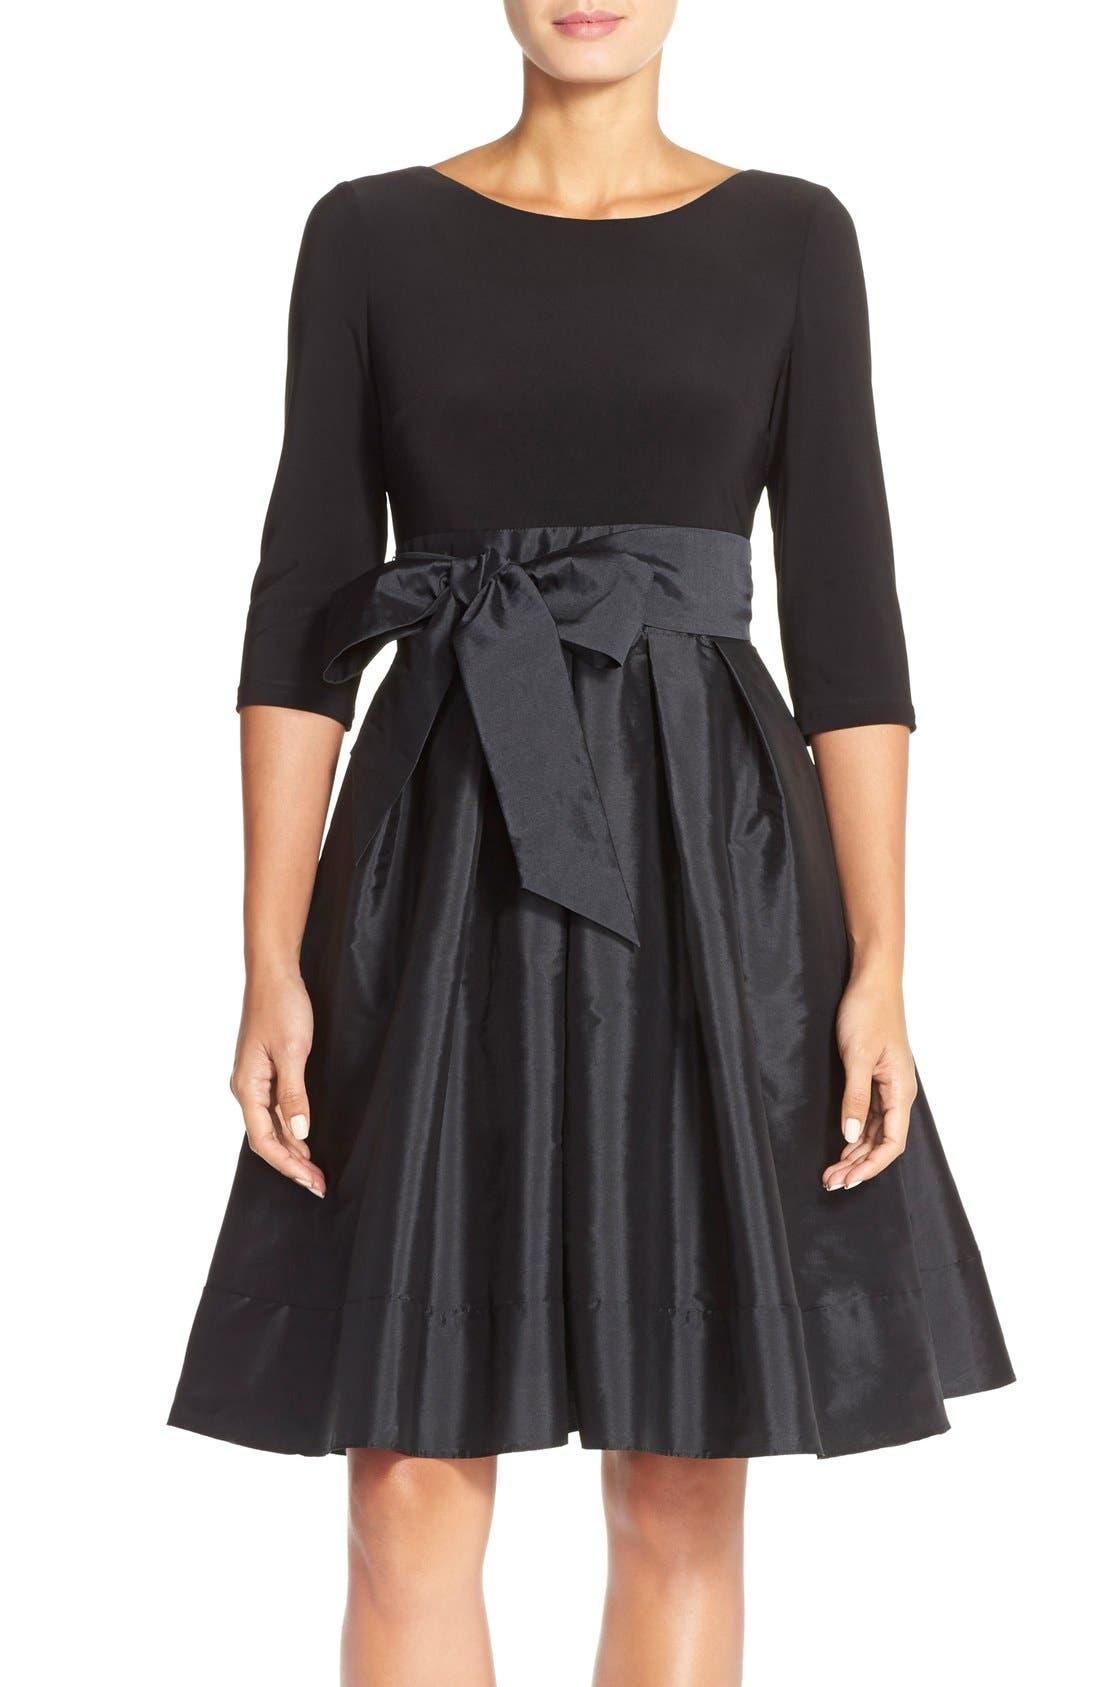 Alternate Image 1 Selected - Adrianna PapellBow Taffeta Fit & Flare Dress (Regular & Petite)